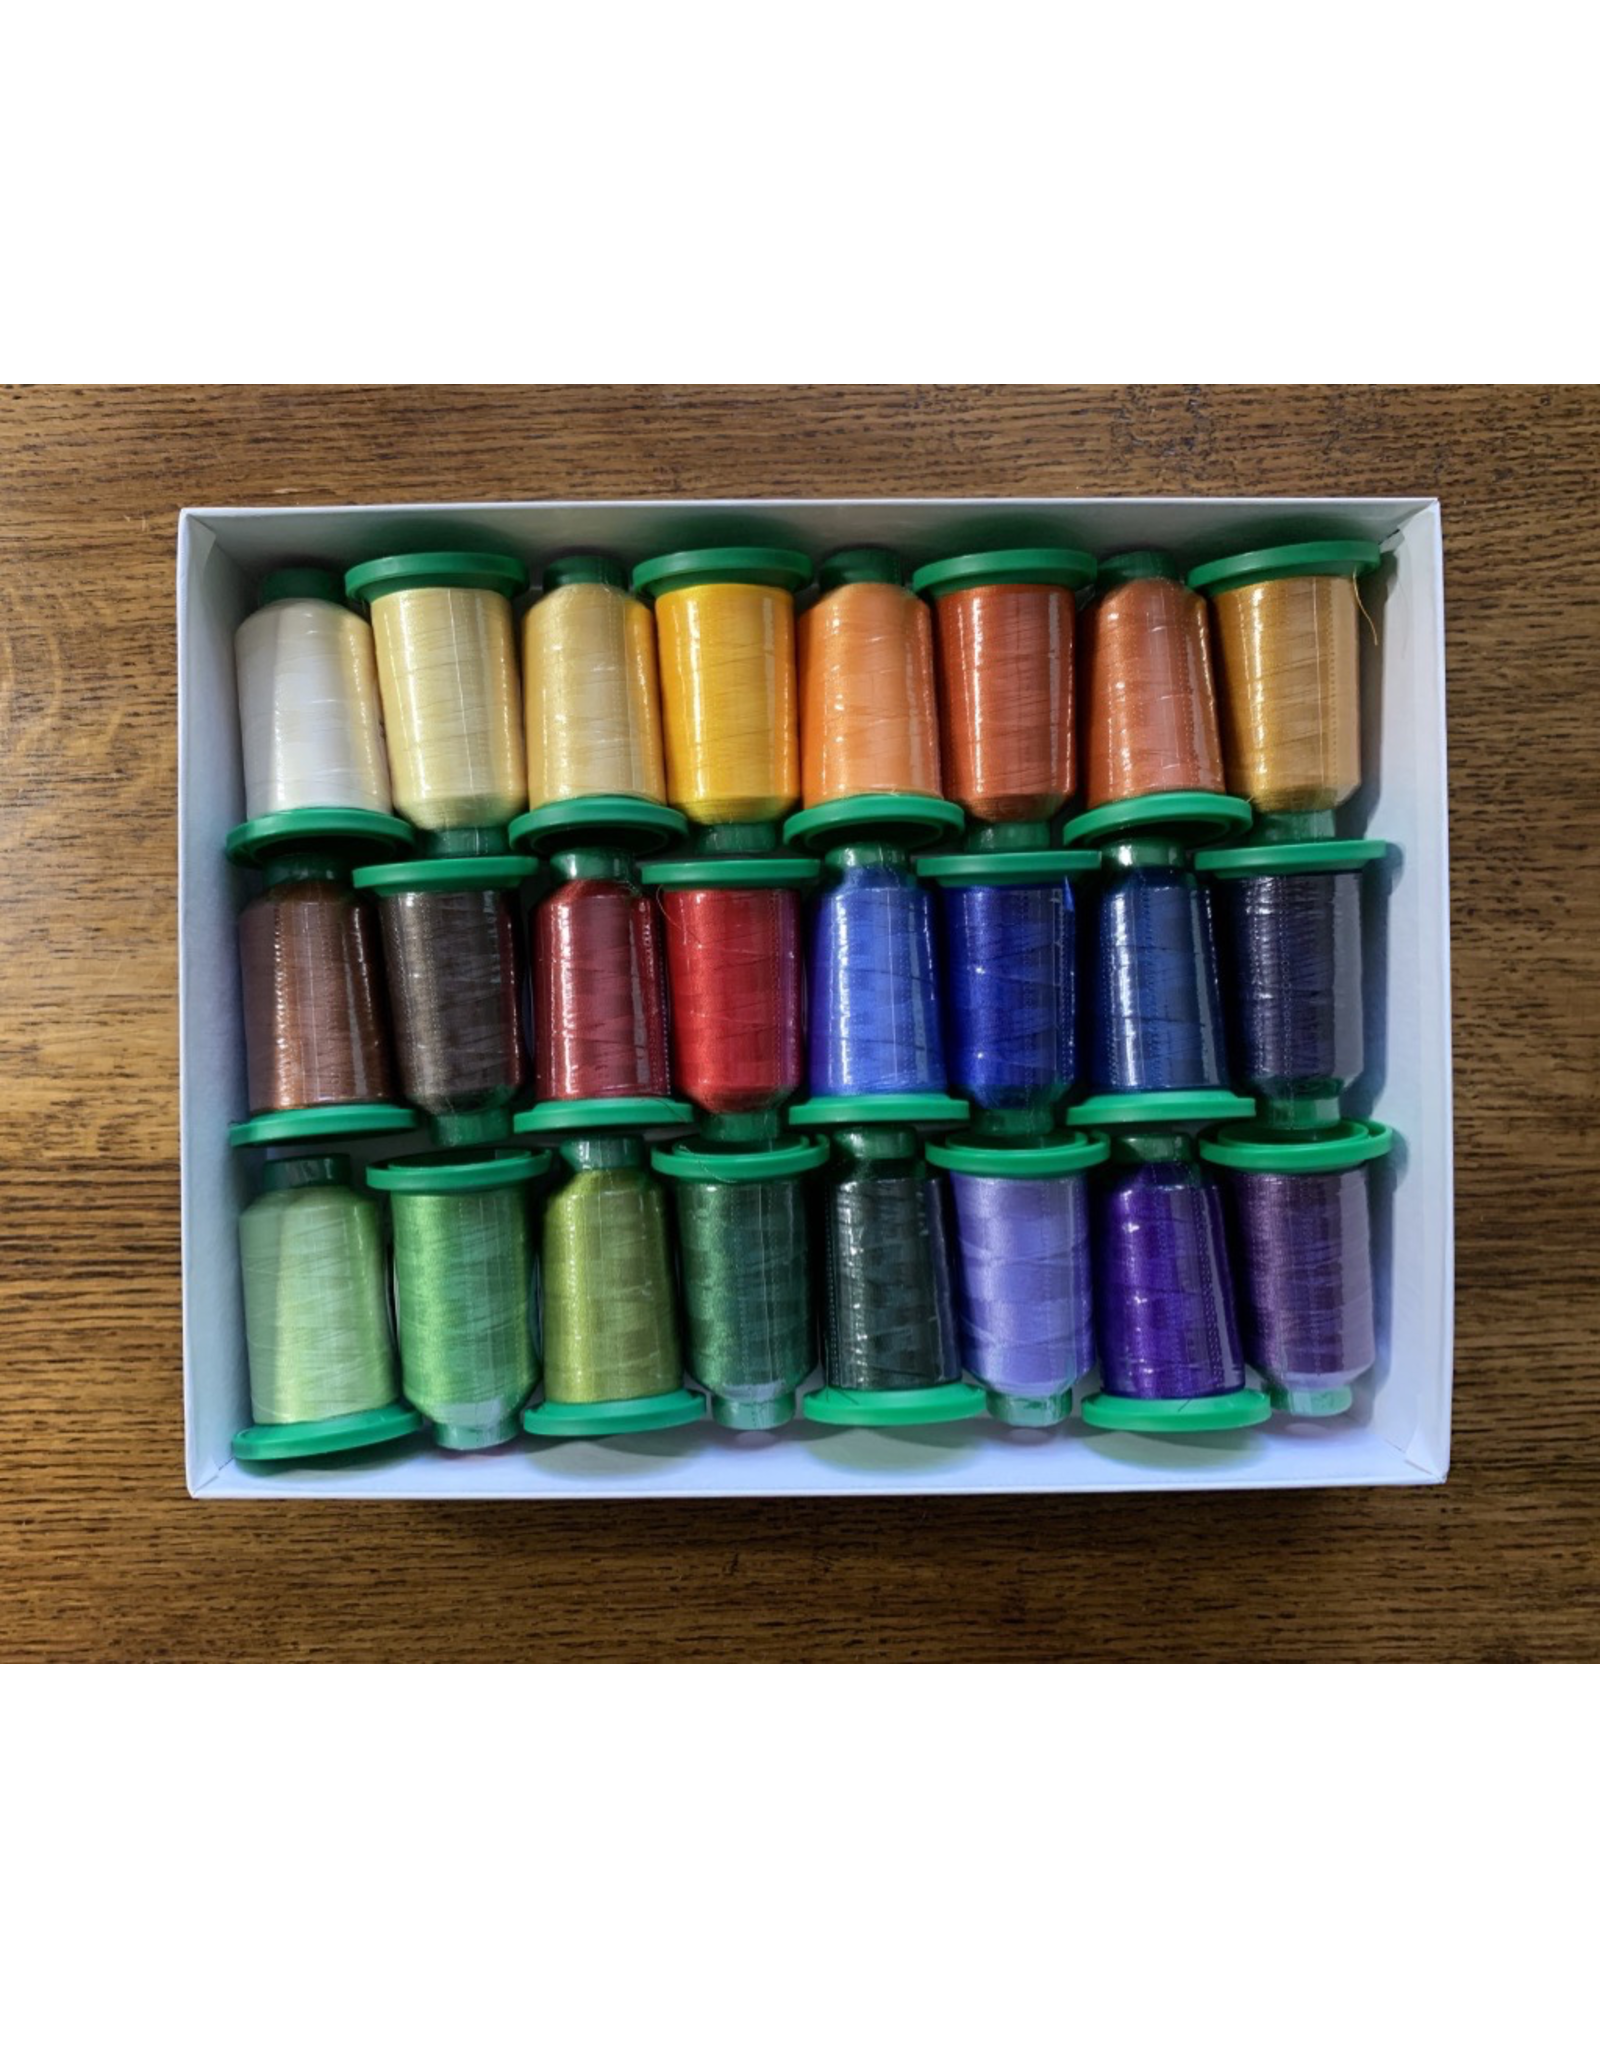 Isacord Thread Set - Bloomin' Mats - 24 Spools & Schmetz Needles